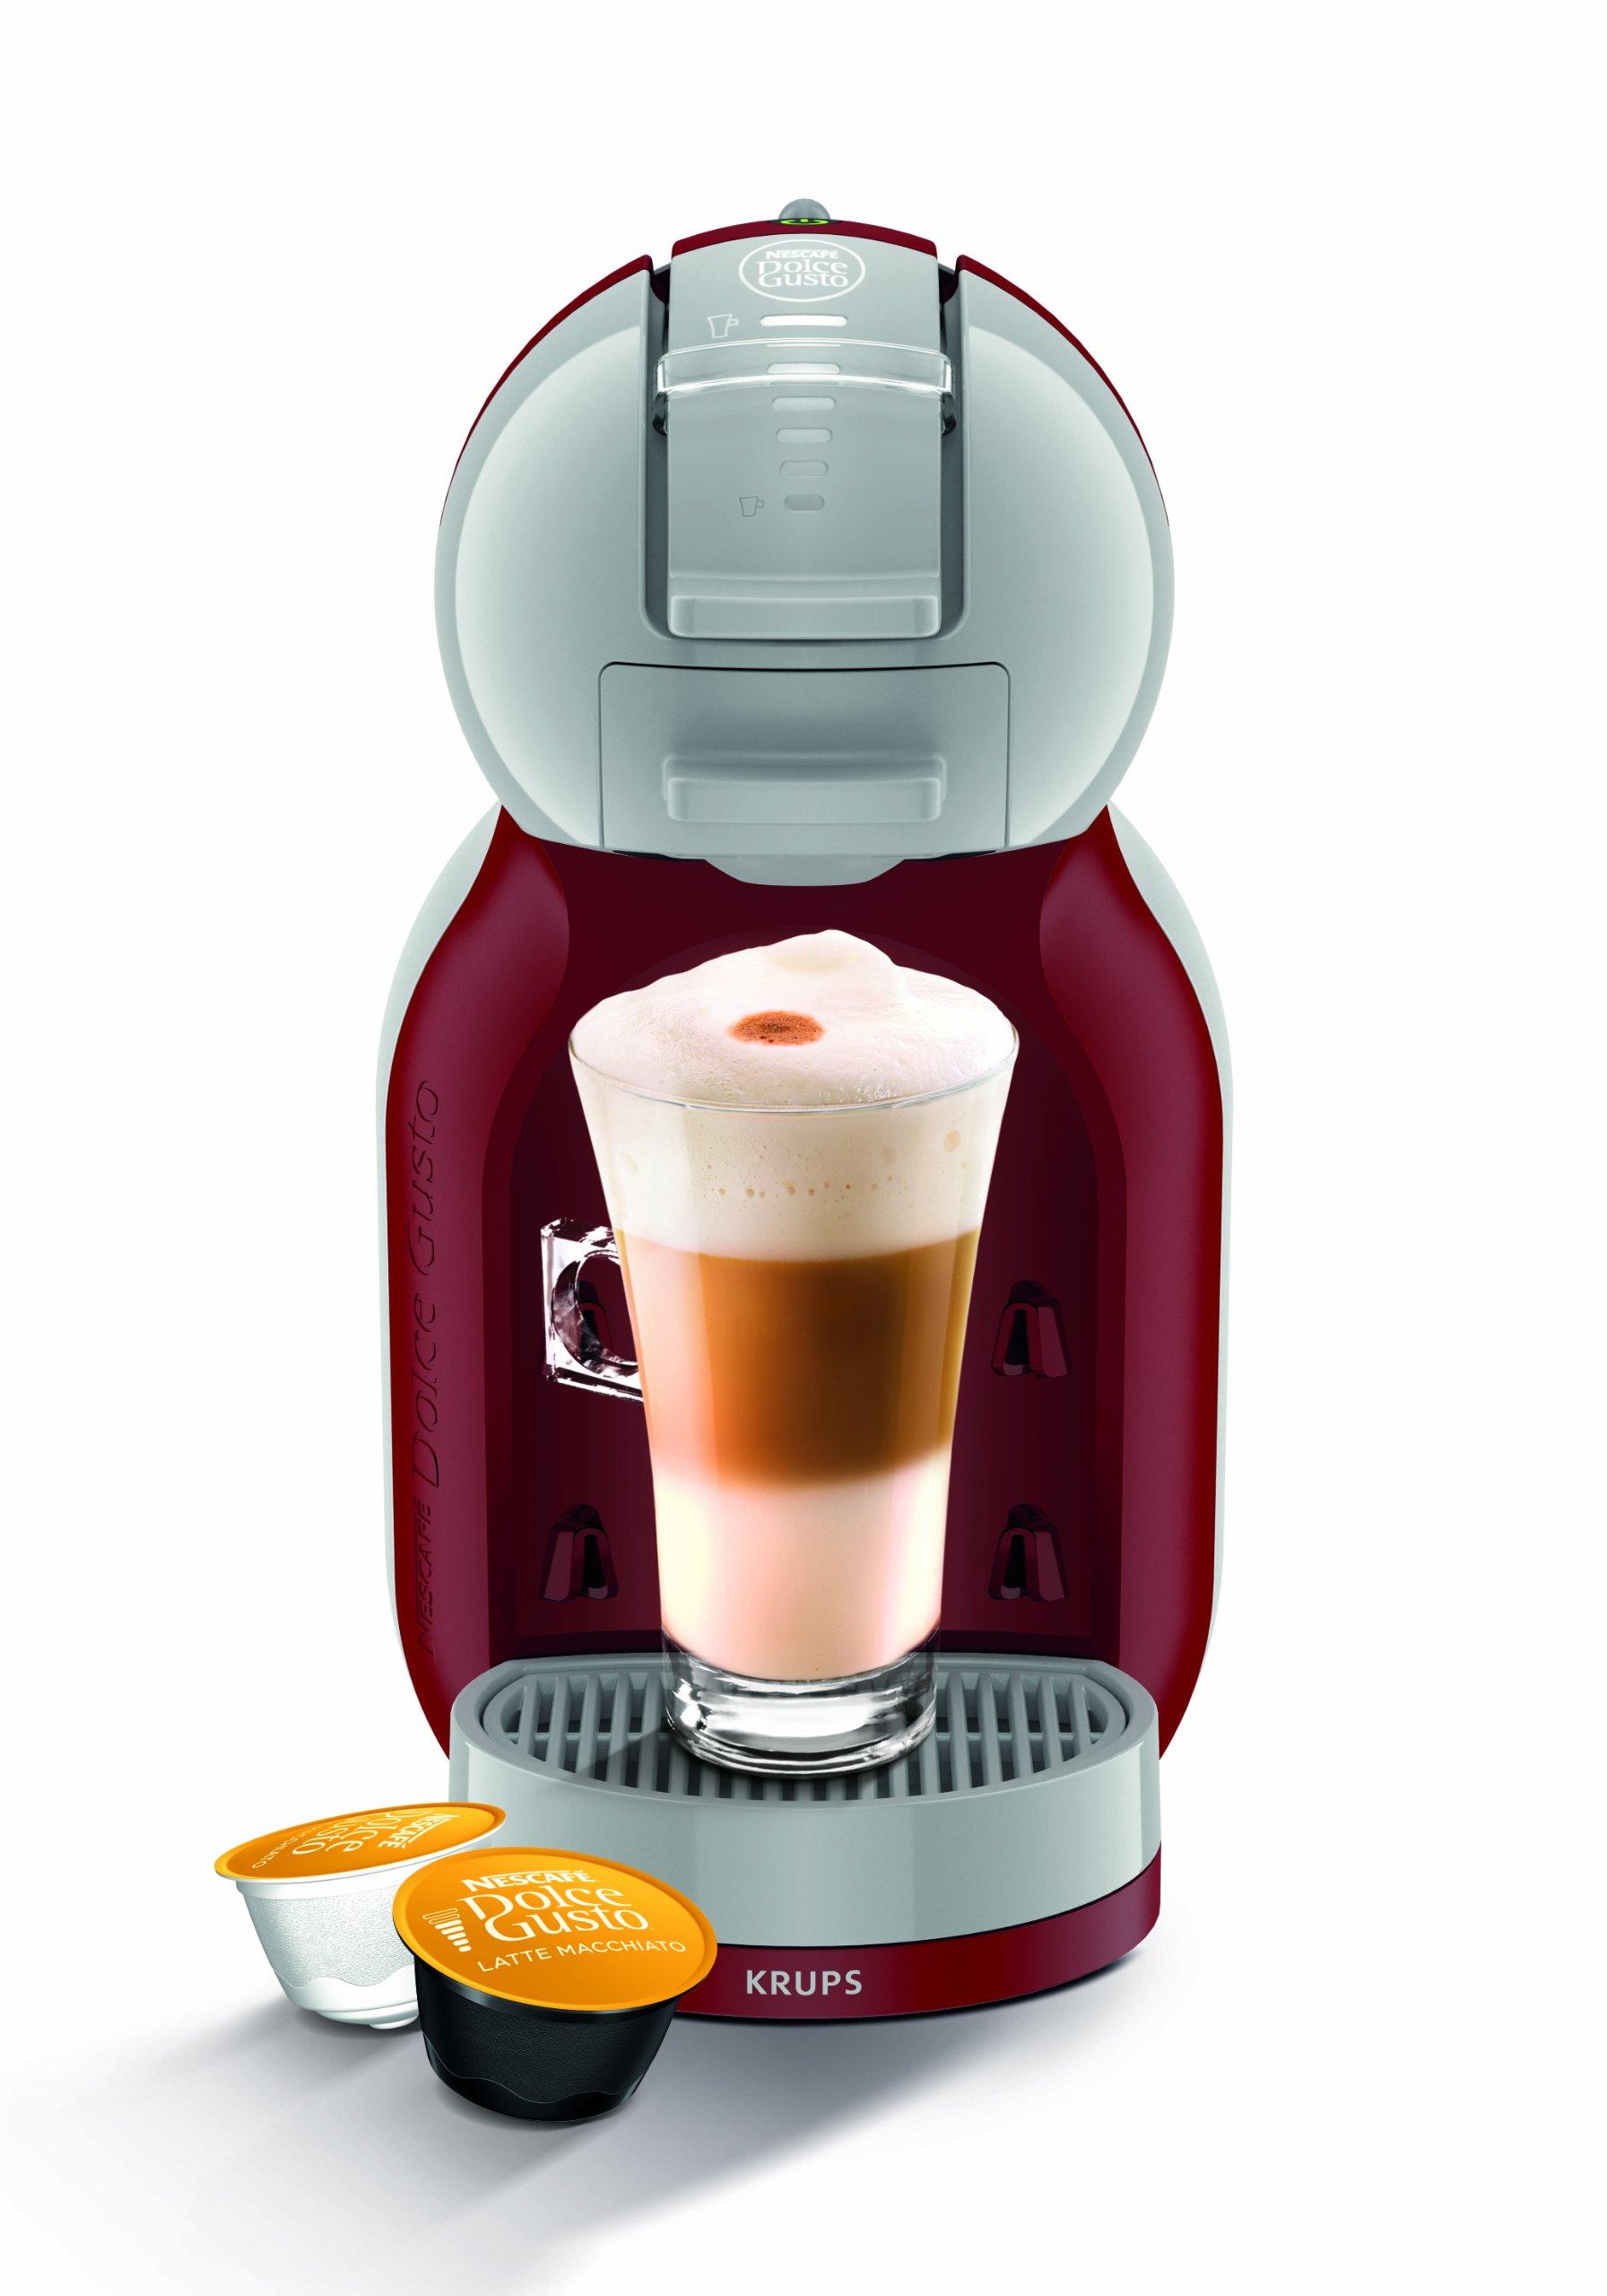 nescafe dolce gusto mini me automatic coffee machine grey. Black Bedroom Furniture Sets. Home Design Ideas